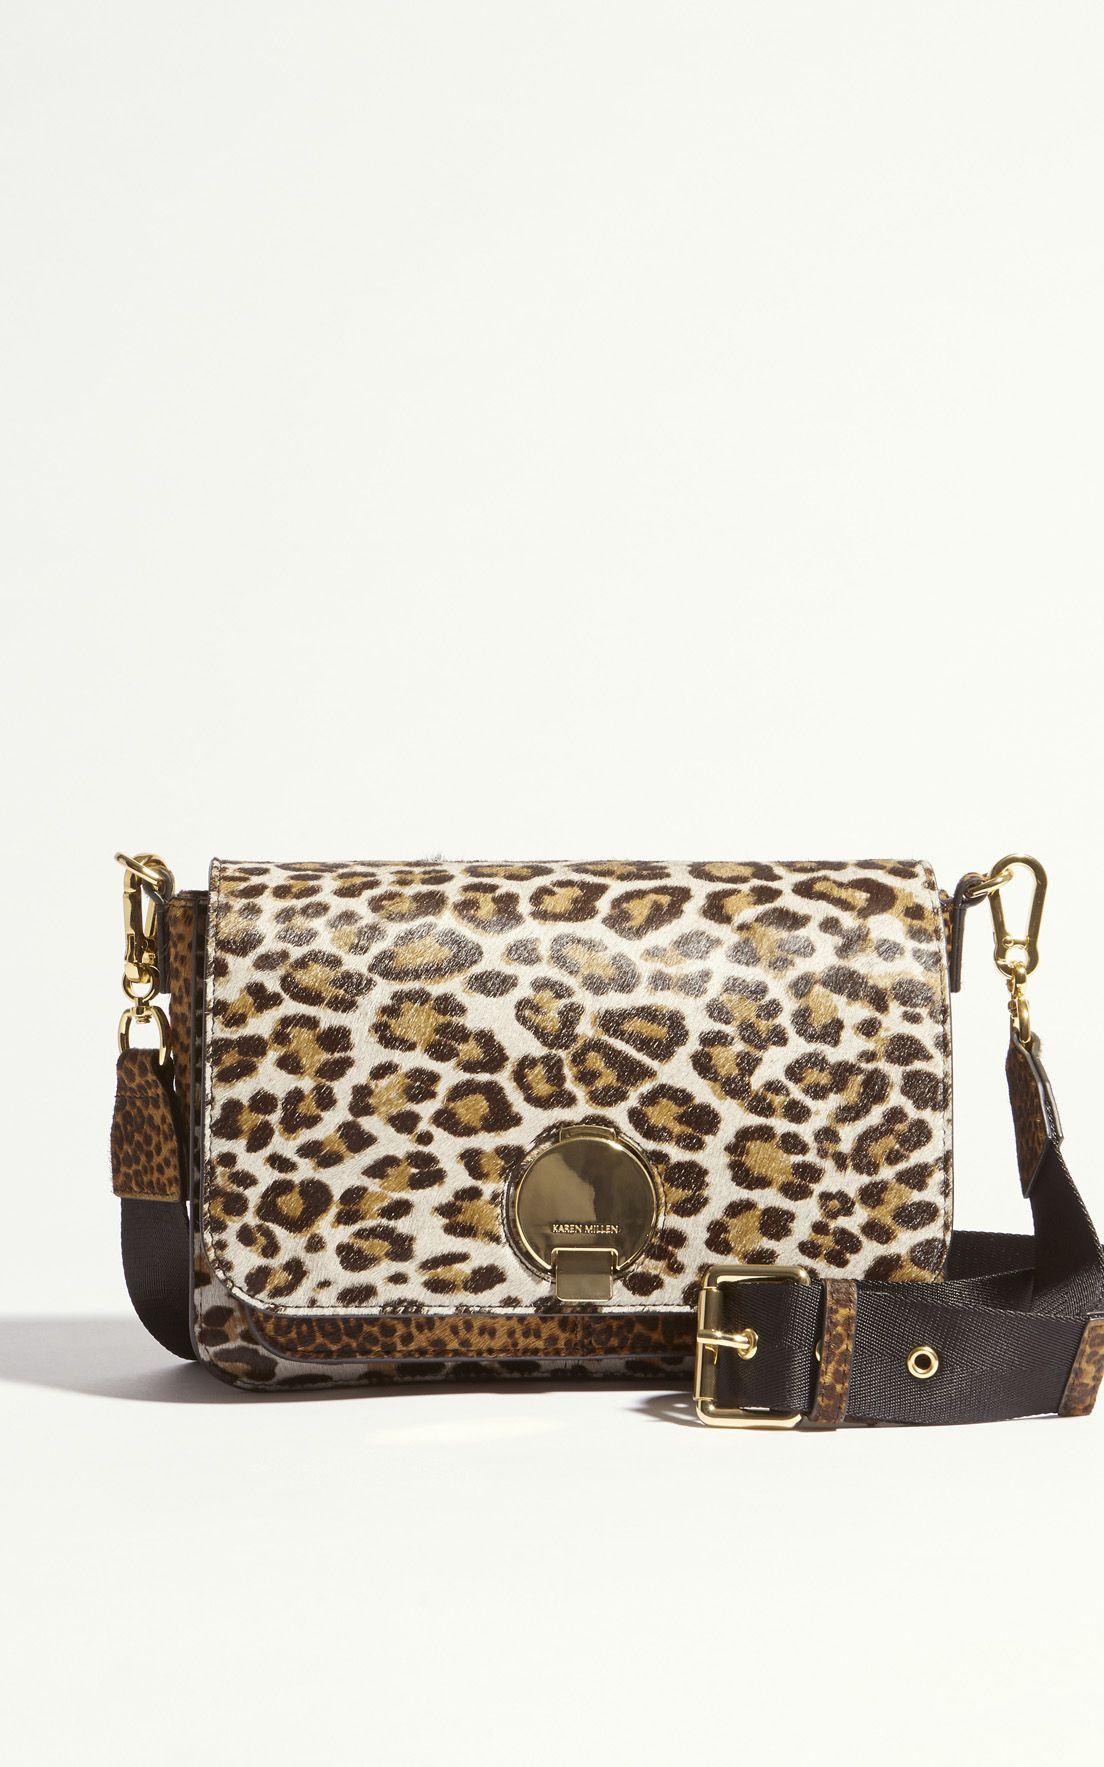 cd07a96fac9 Karen Millen, SHOULDER STRAP CROSS-BODY BAG Leopard Print ...